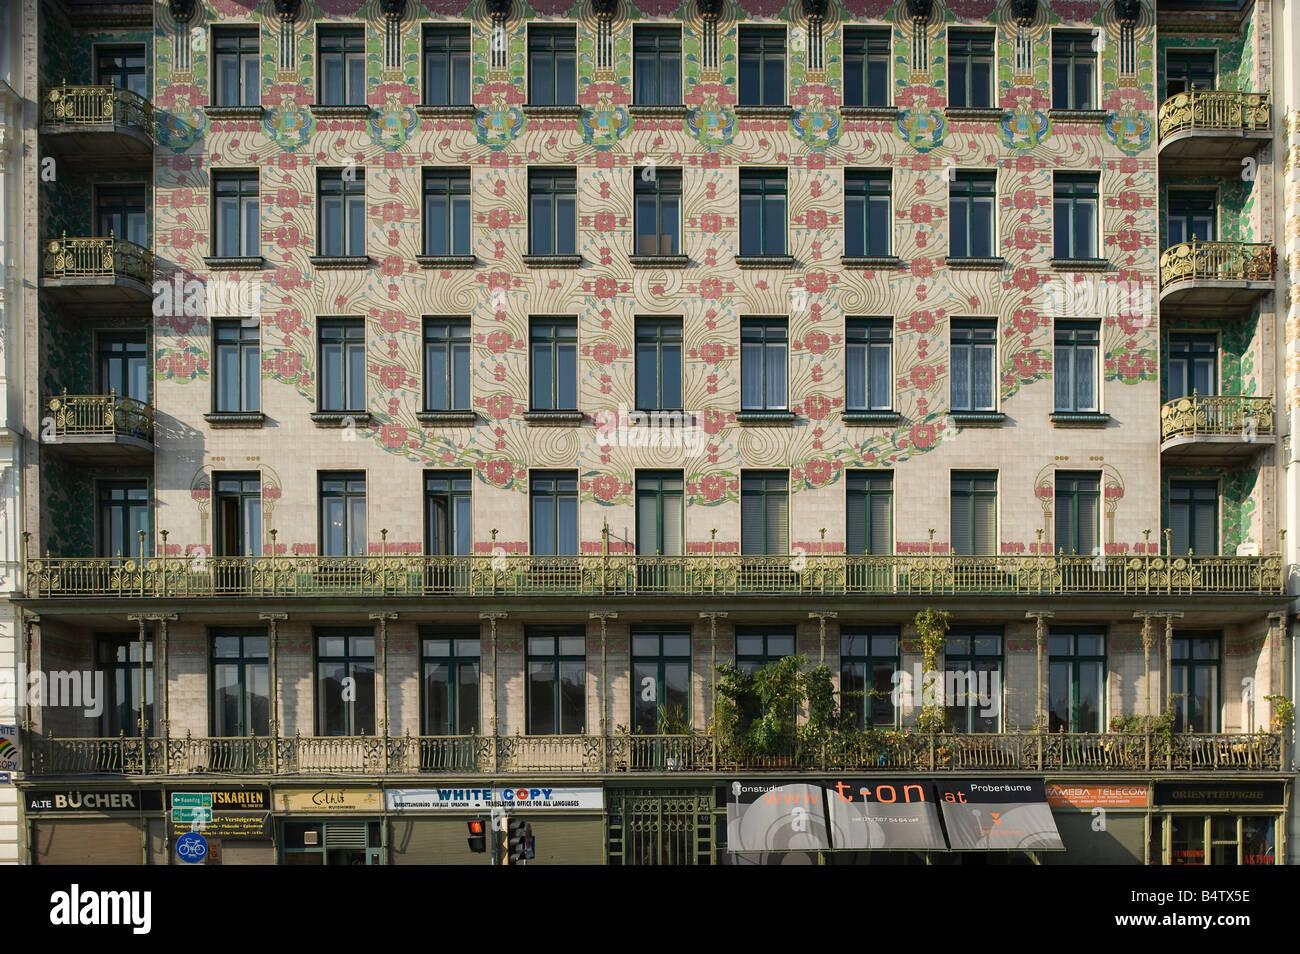 Vienna Art Nouveau House Majolikahaus by Architect Otto Wagner Linke  Wienzeile 40